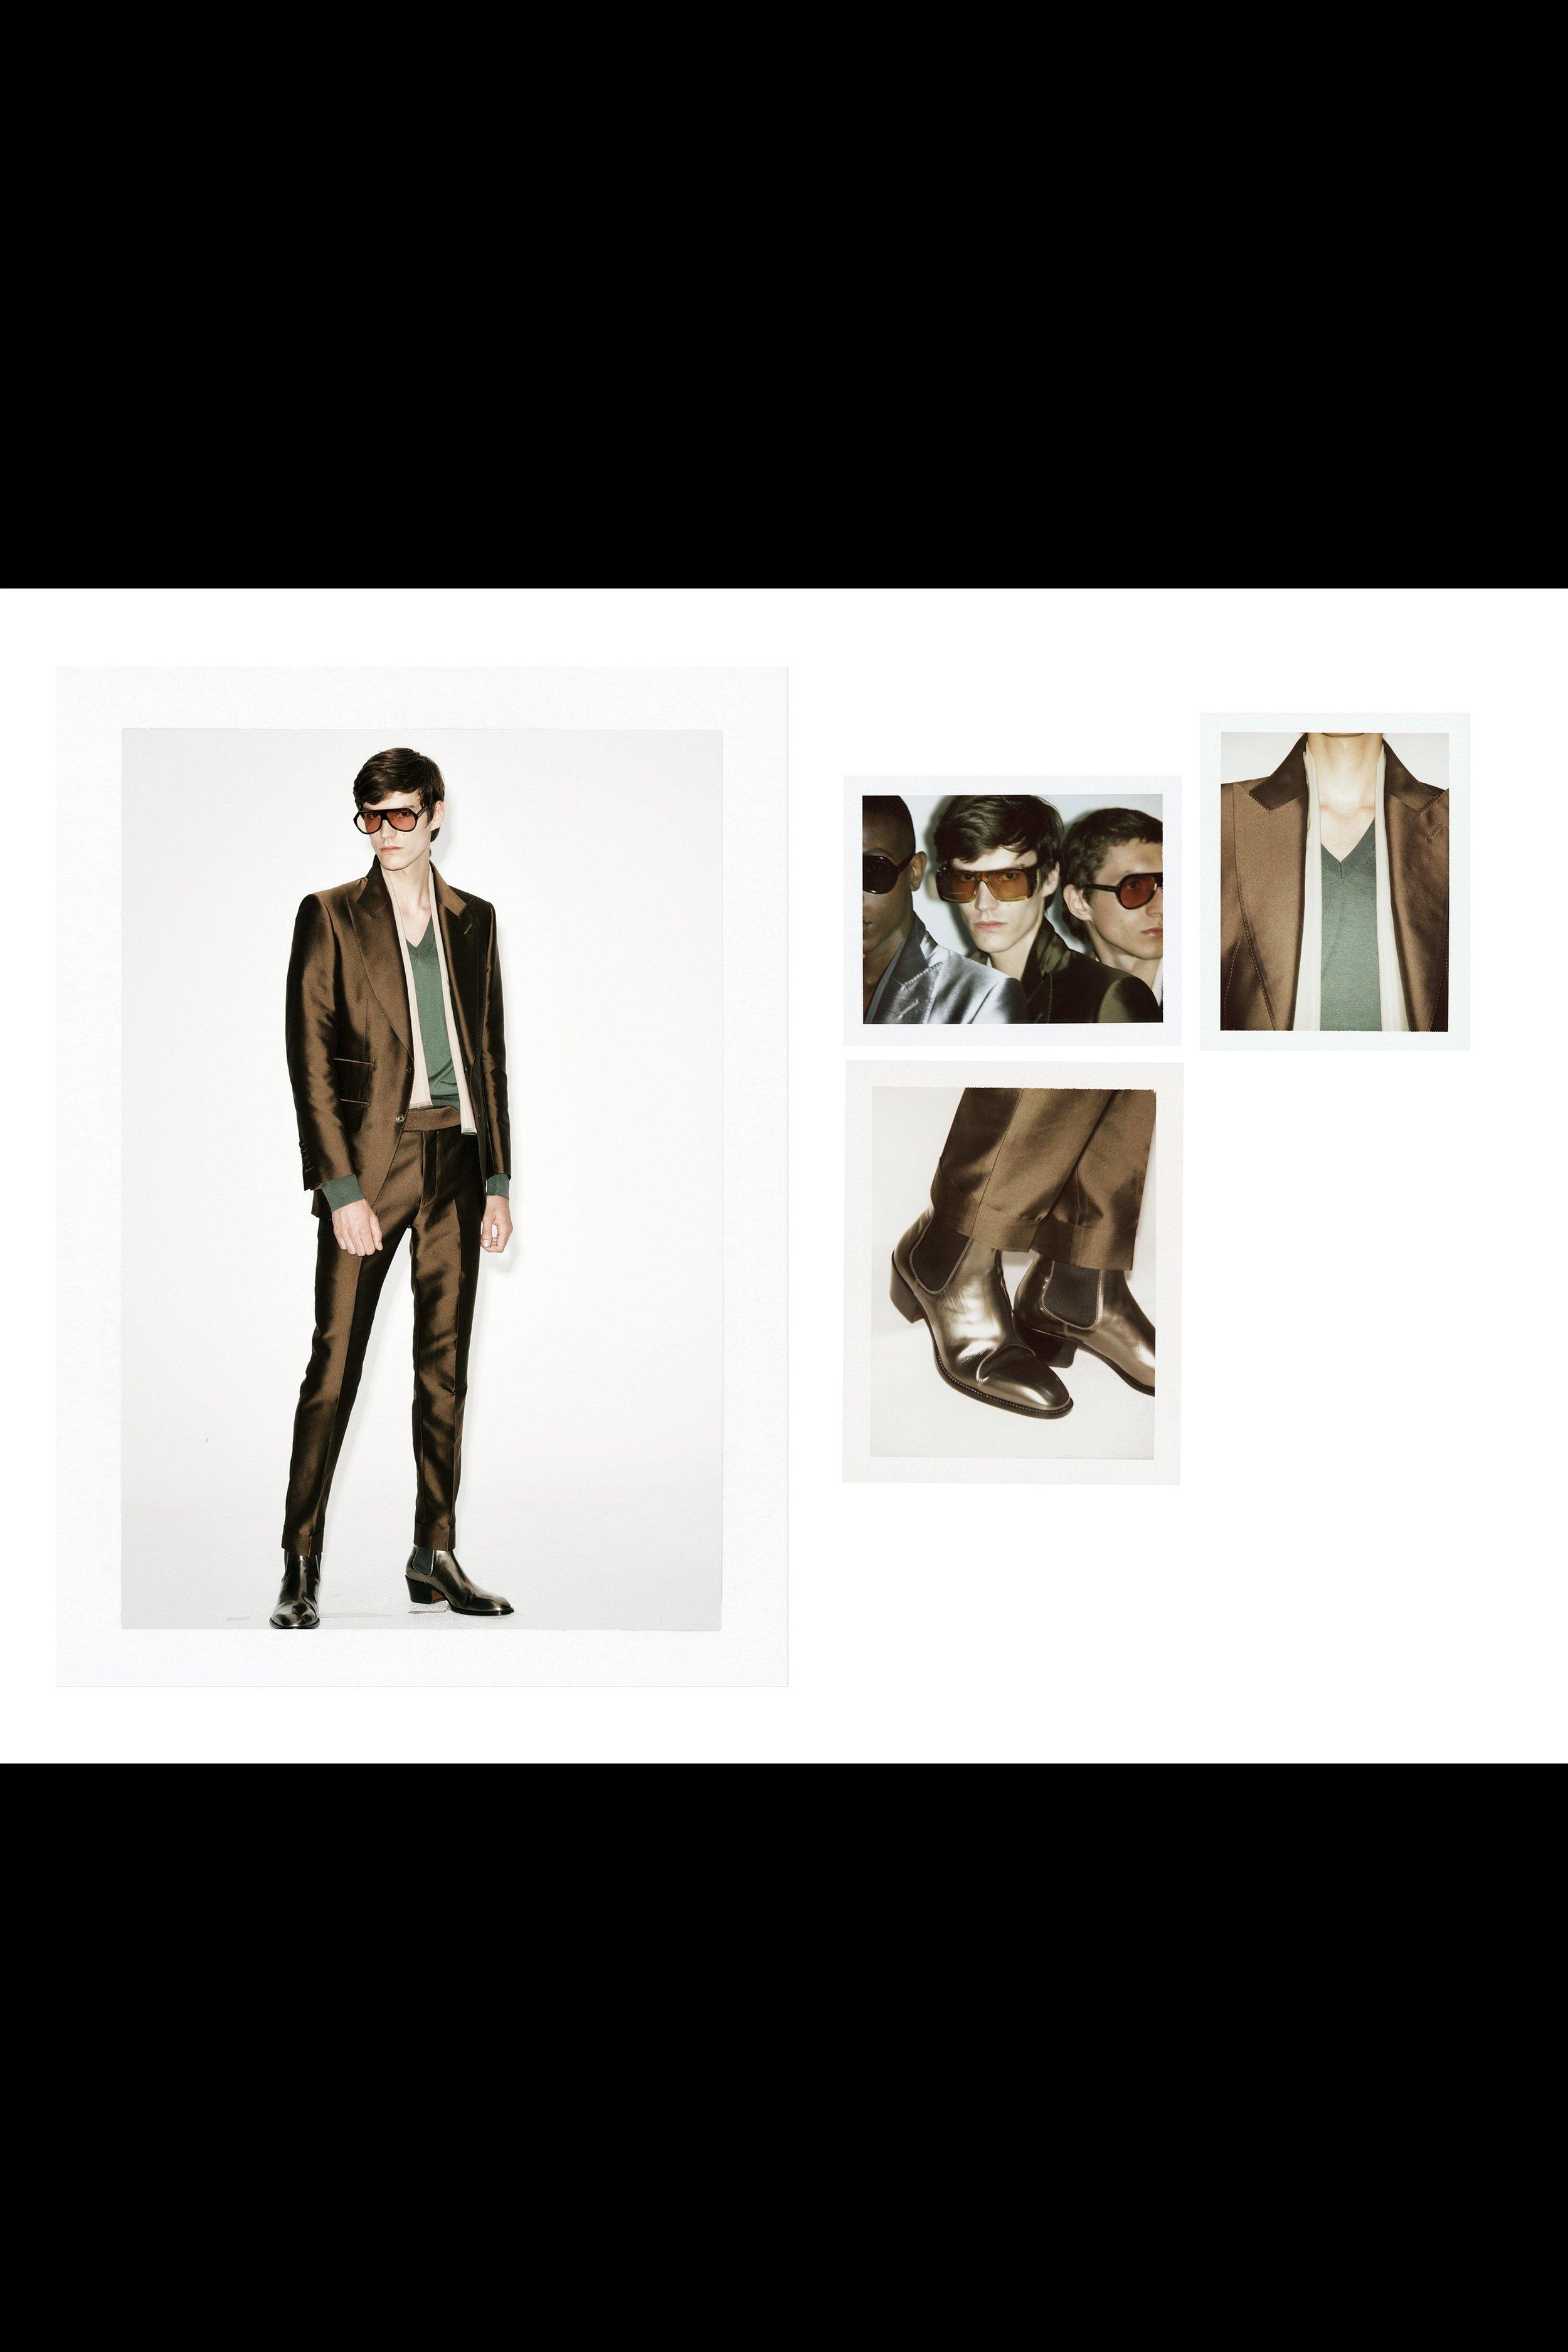 00033-Tom-Ford-vogue-menswear-spring-2019-pr.jpg